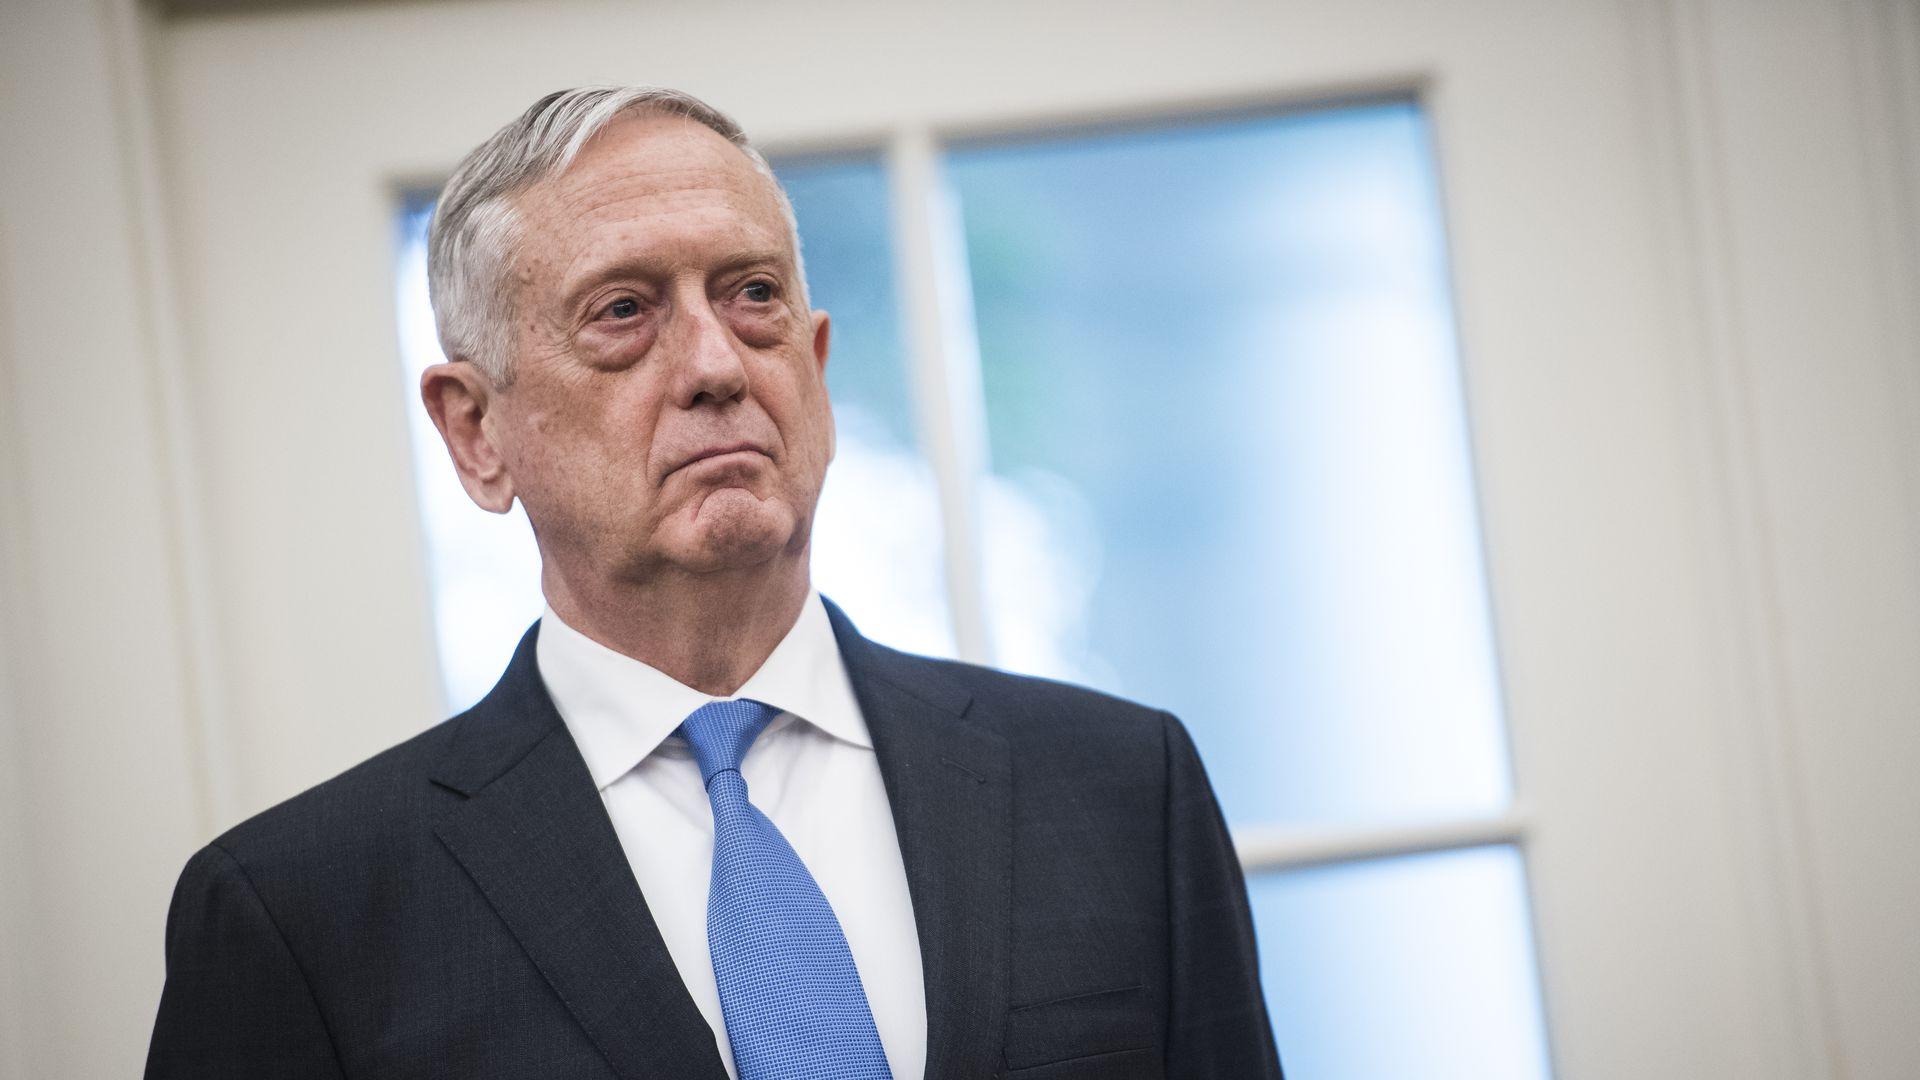 Secretary of Defense Jim Mattis. Photo: Jabin Botsford/The Washington Post via Getty Images